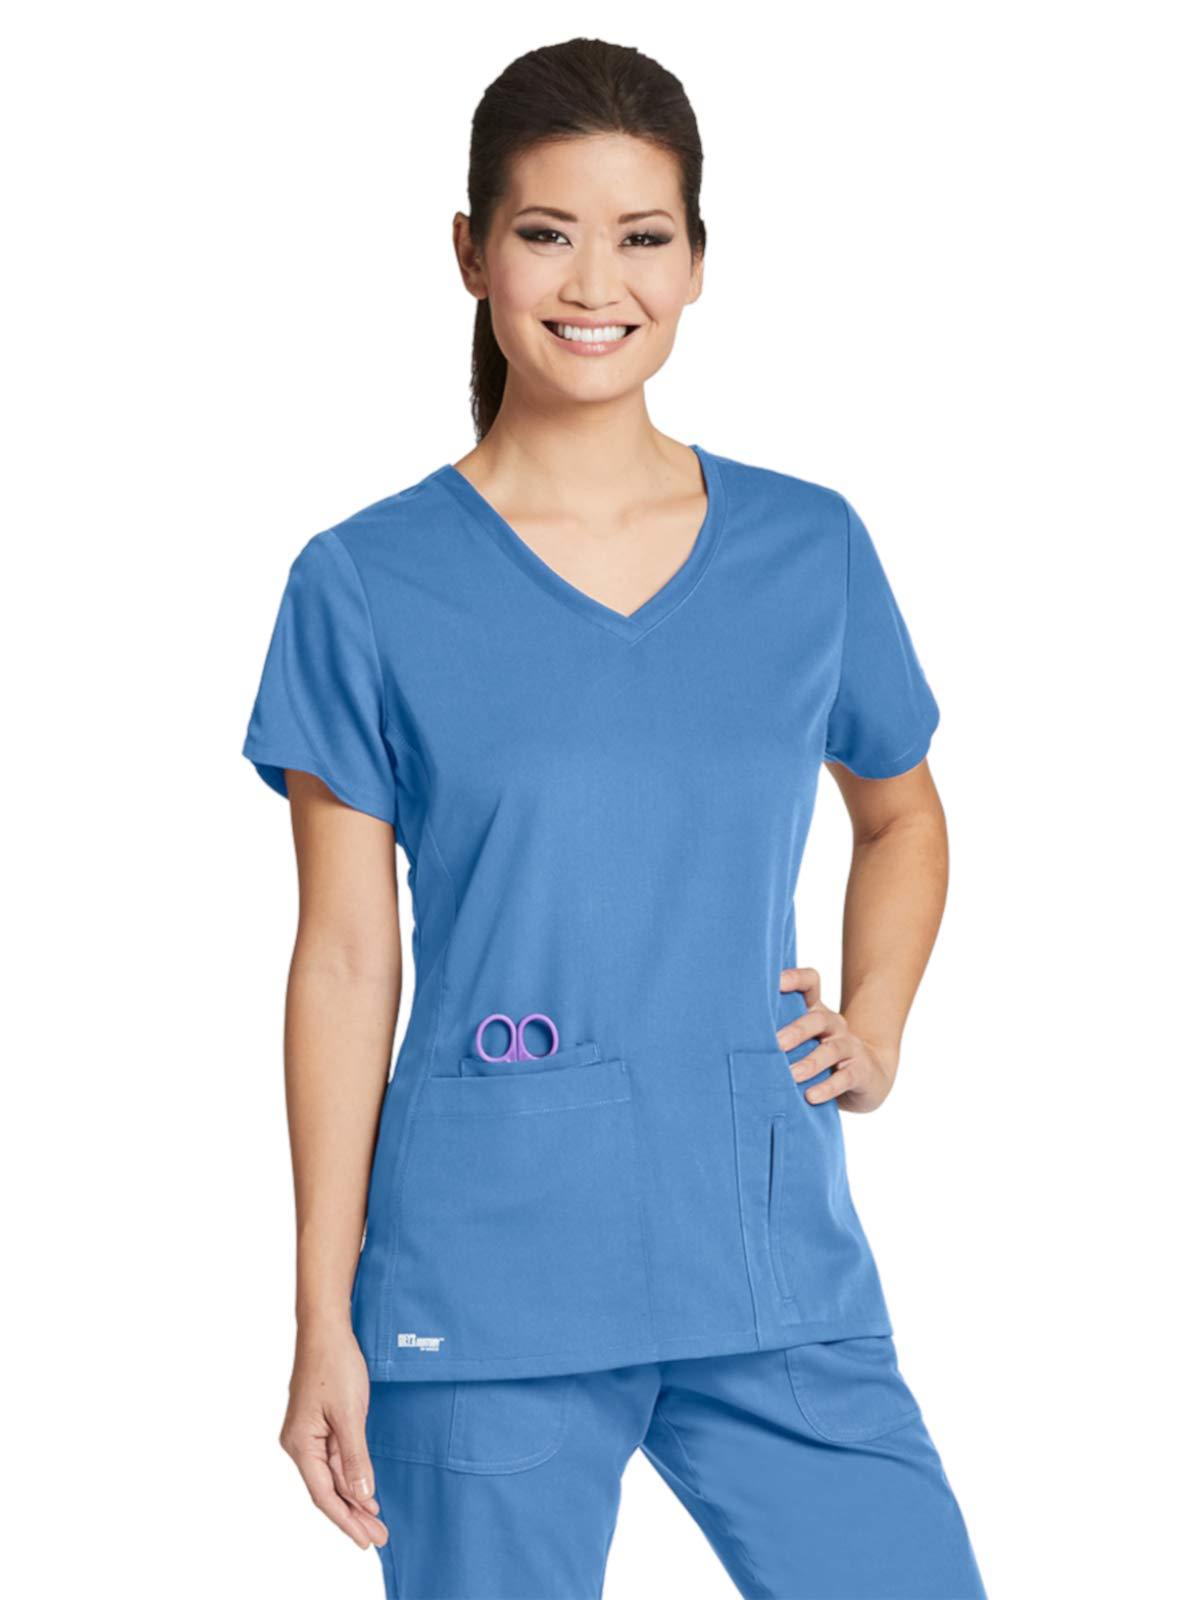 Grey's Anatomy 41423 Top Ciel Blue S by Barco